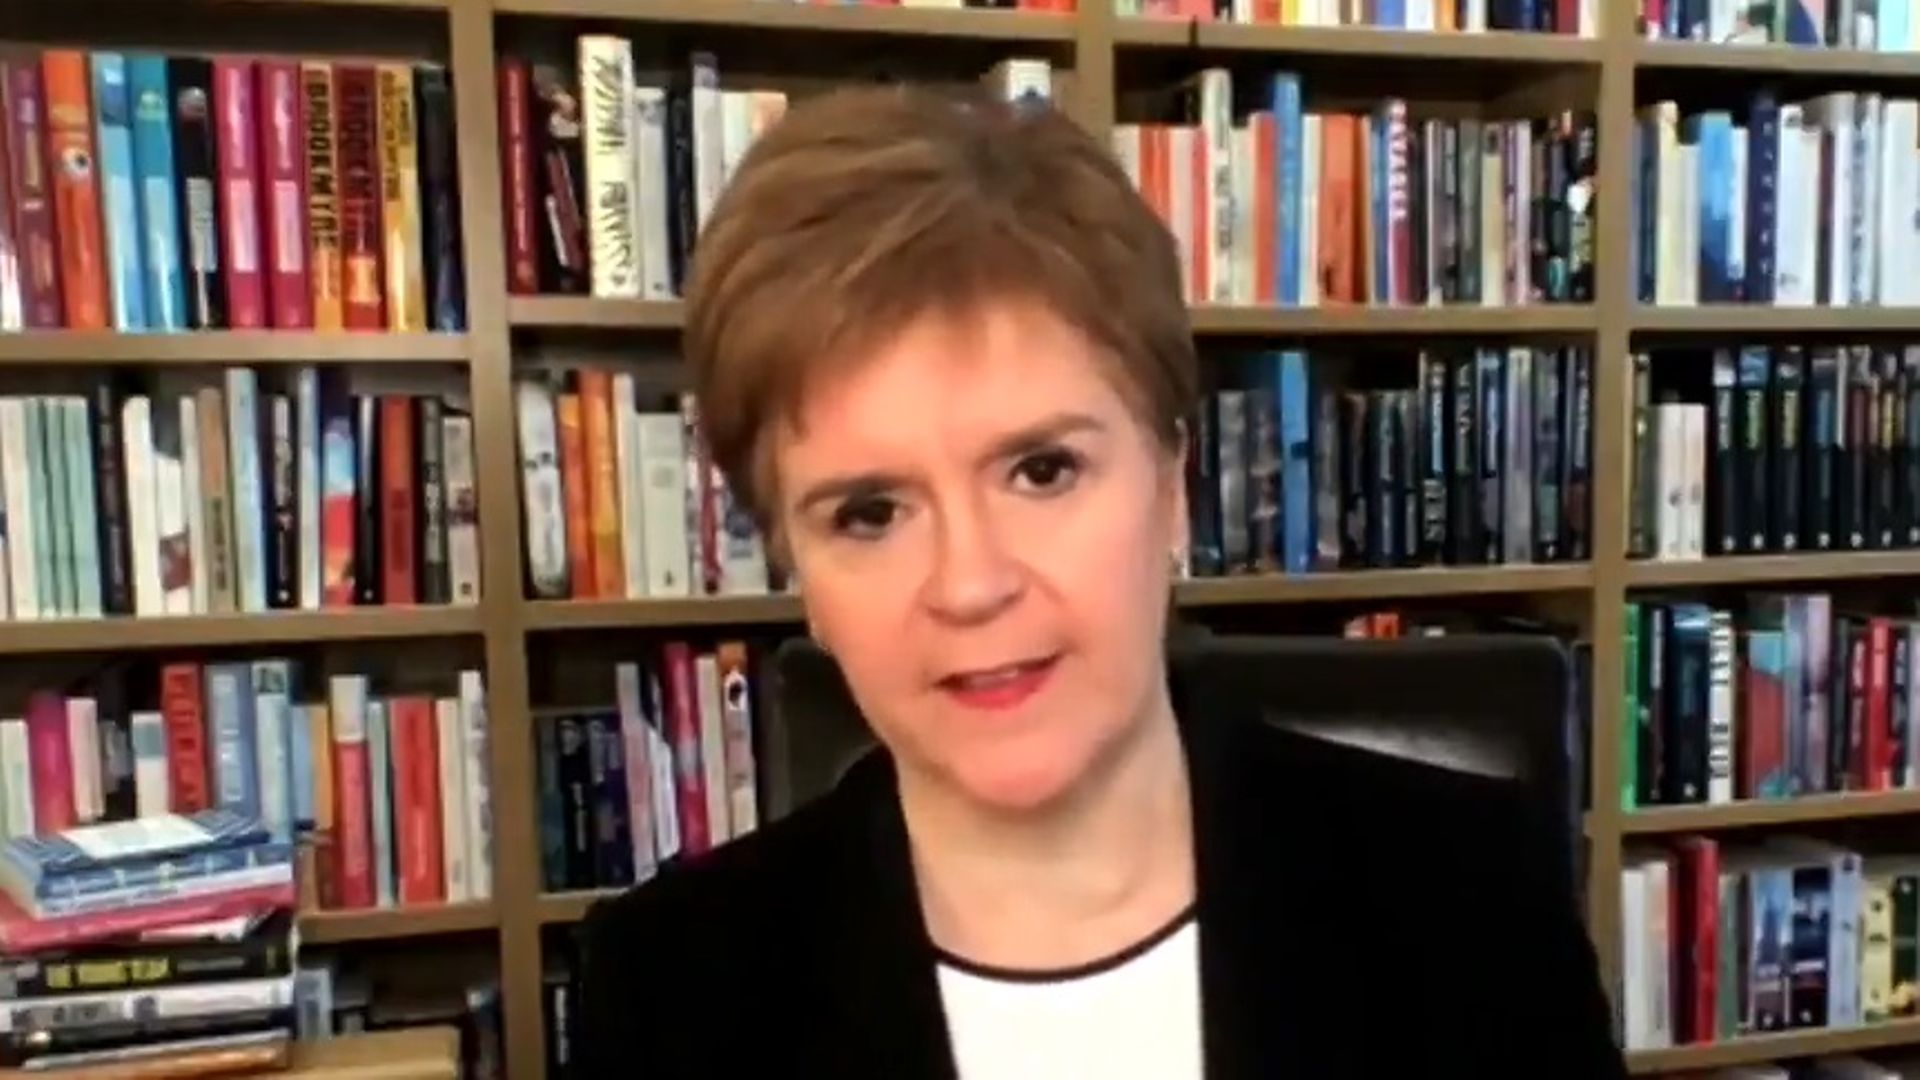 Nicola Sturgeon appears on Good Morning Britain - Credit: ITV